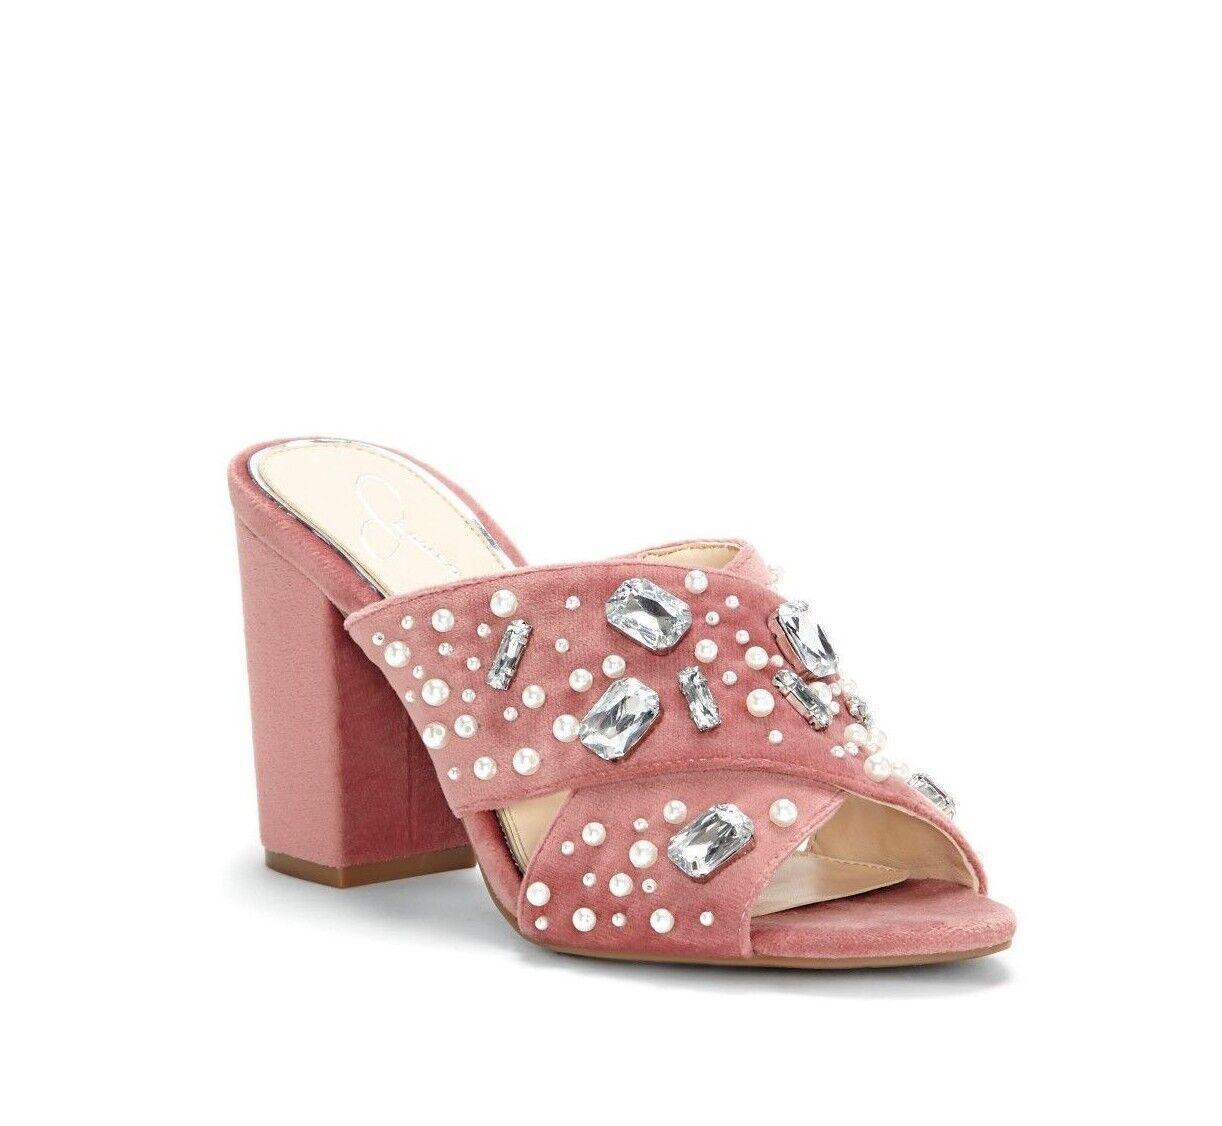 Jessica Simpson Simpson Simpson rizell para mujer Talla 6.5M Terciopelo Diapositivas de Diamantes de Imitación Perla rosado  muy popular